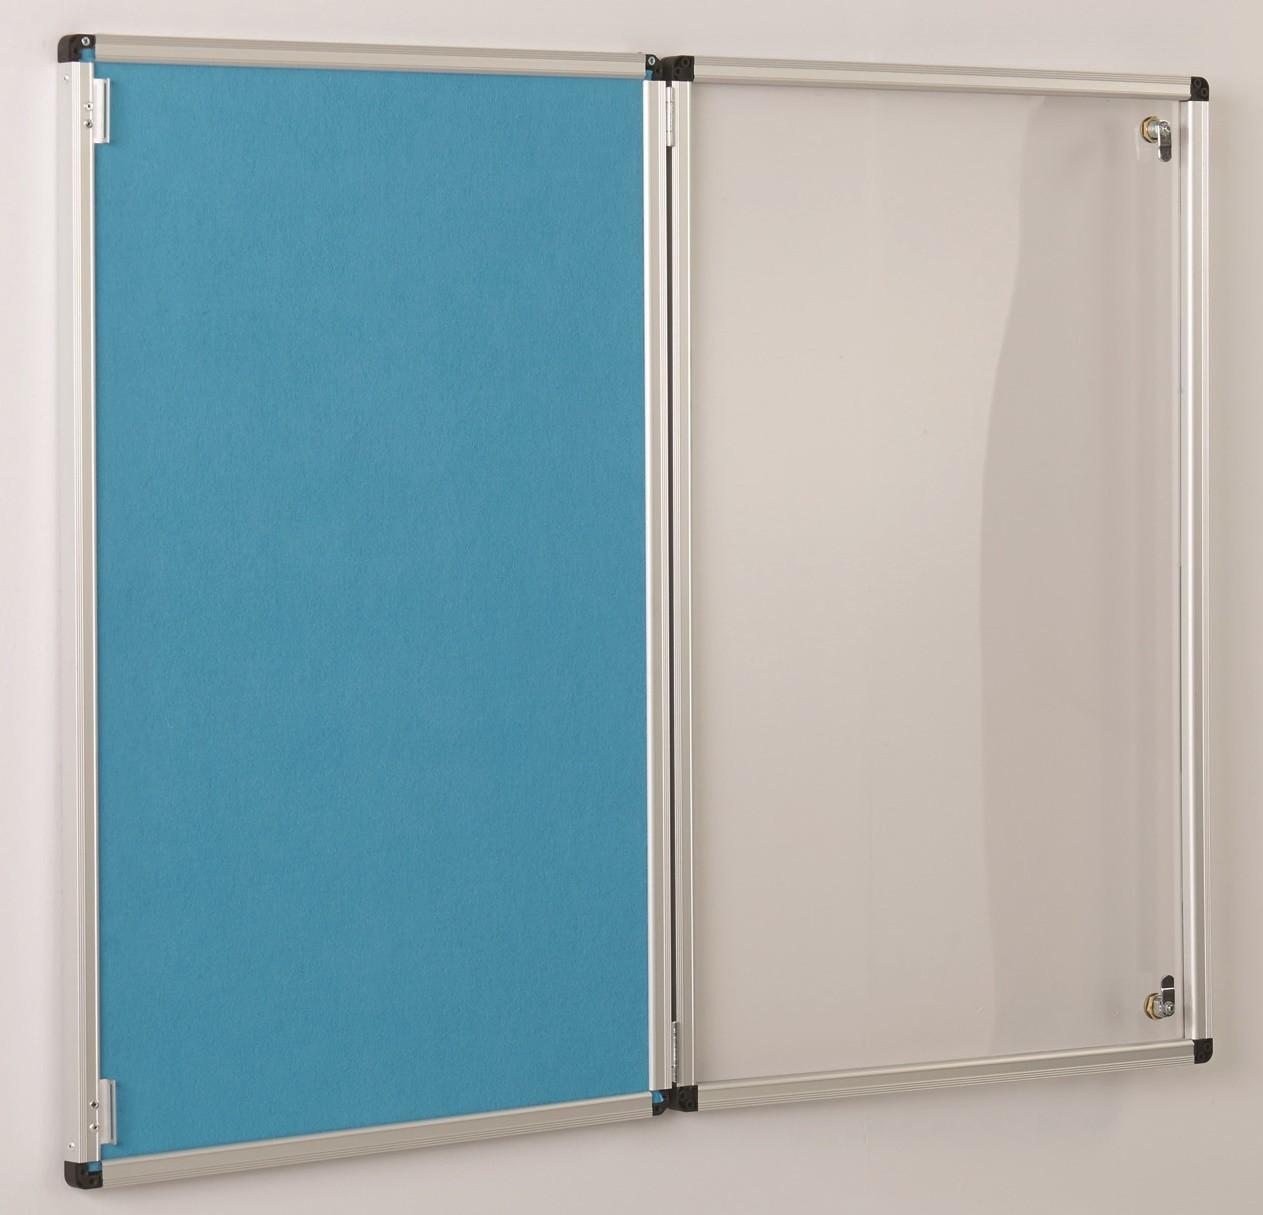 An image of Colourway Tamperproof Noticeboards - Lockable Noticeboards